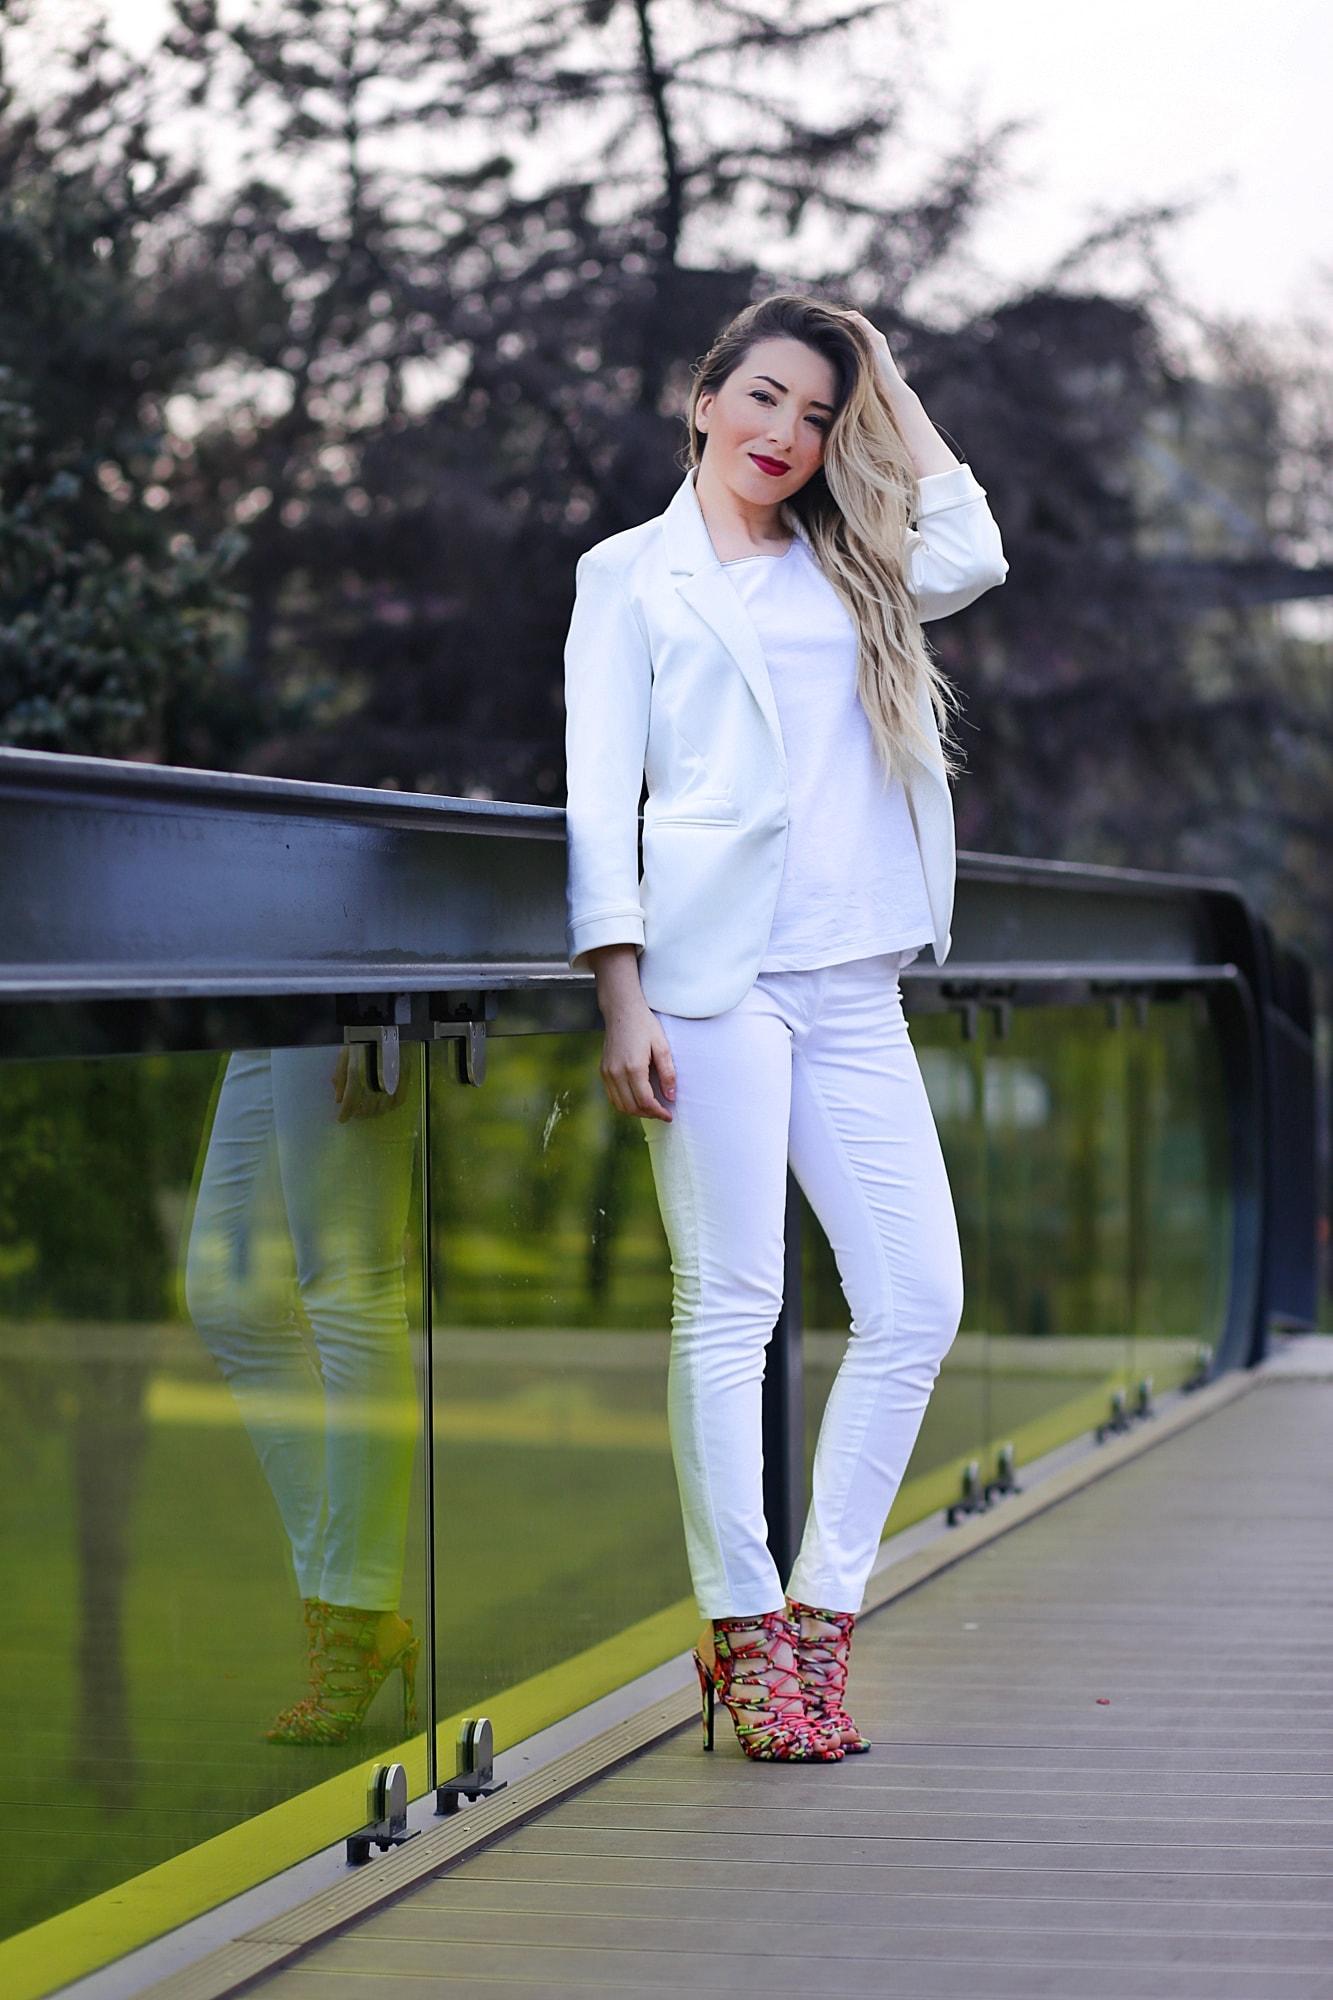 Andreea Ristea - tinuta de primavara totul alb cu sandale colorate cu toc by amiclubwear